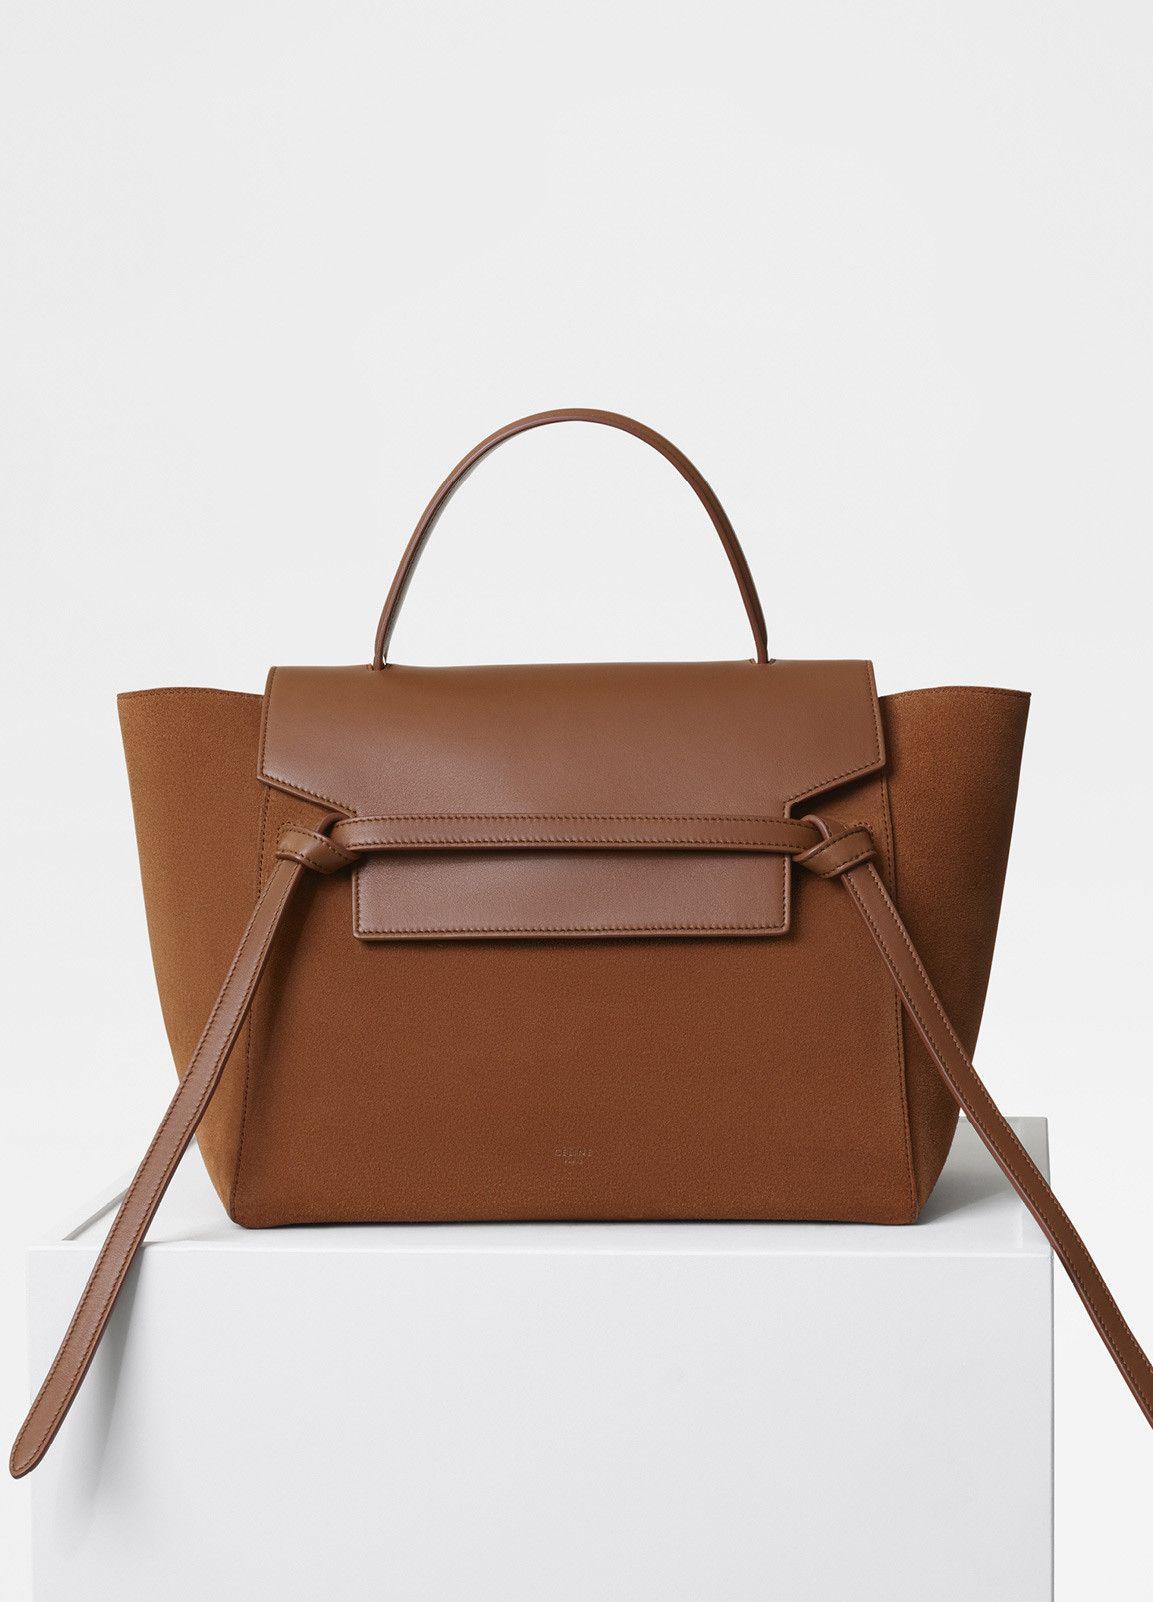 e61ed4762e Celine Tan Suede Mini Belt Bag